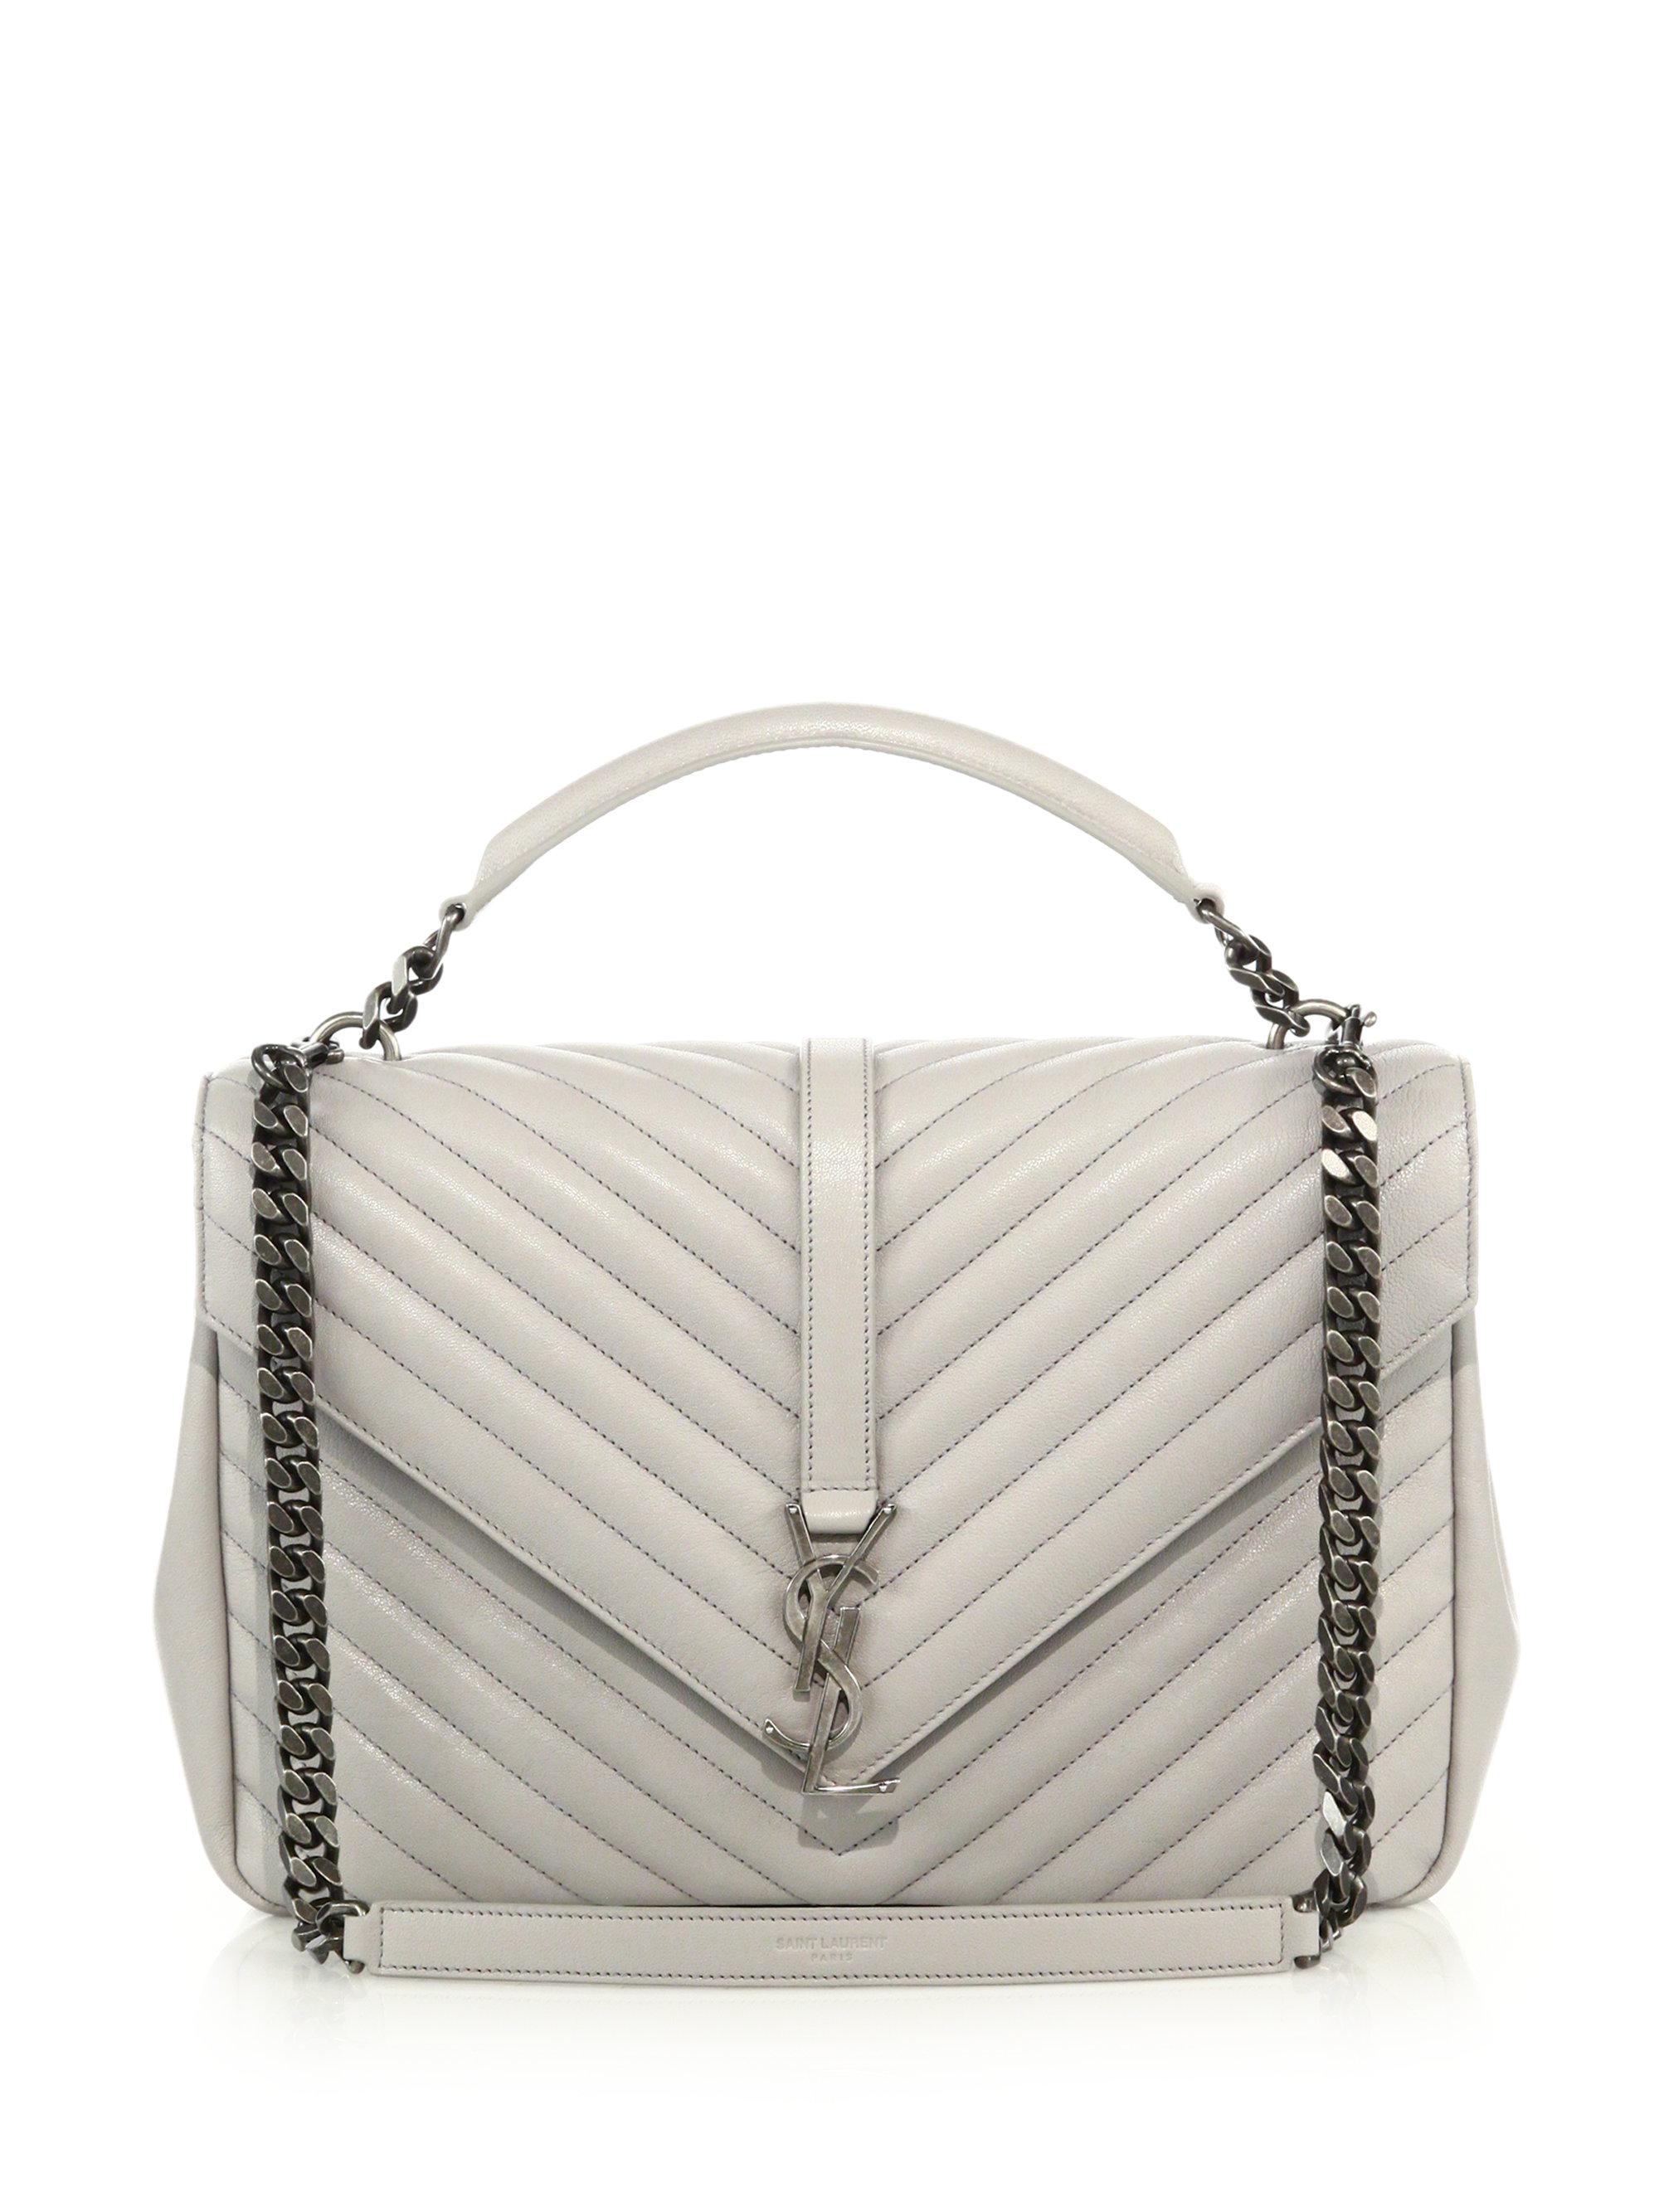 ysl replica handbag - Saint laurent Monogram Medium Matelasse Leather College Bag in ...